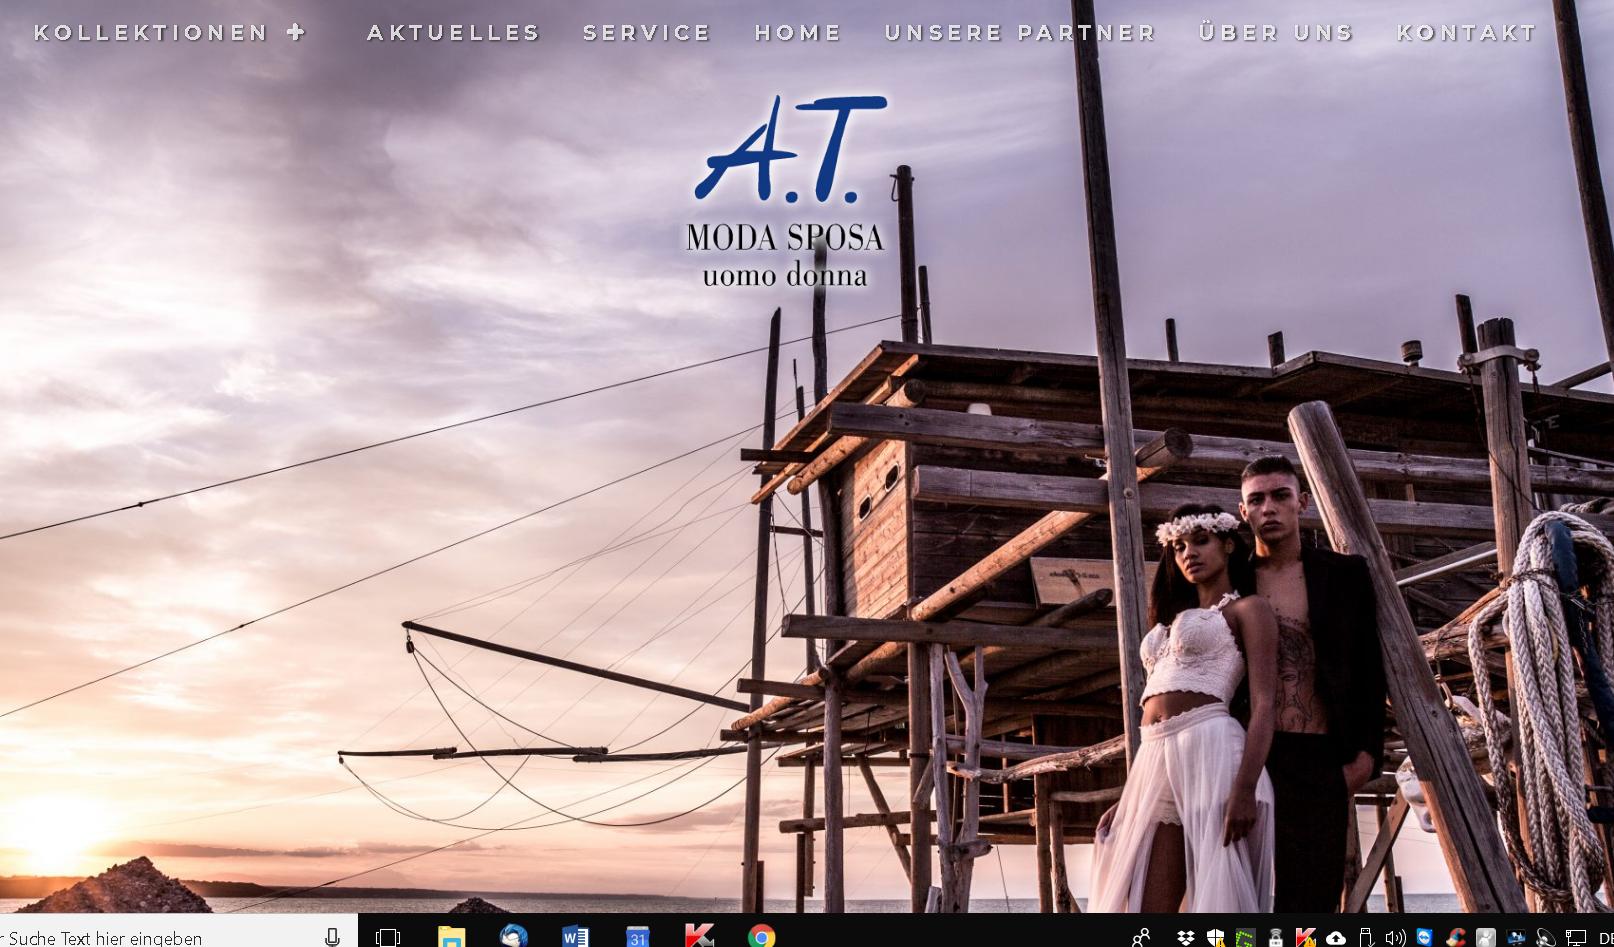 A.T. Moda Sposa - Startbild